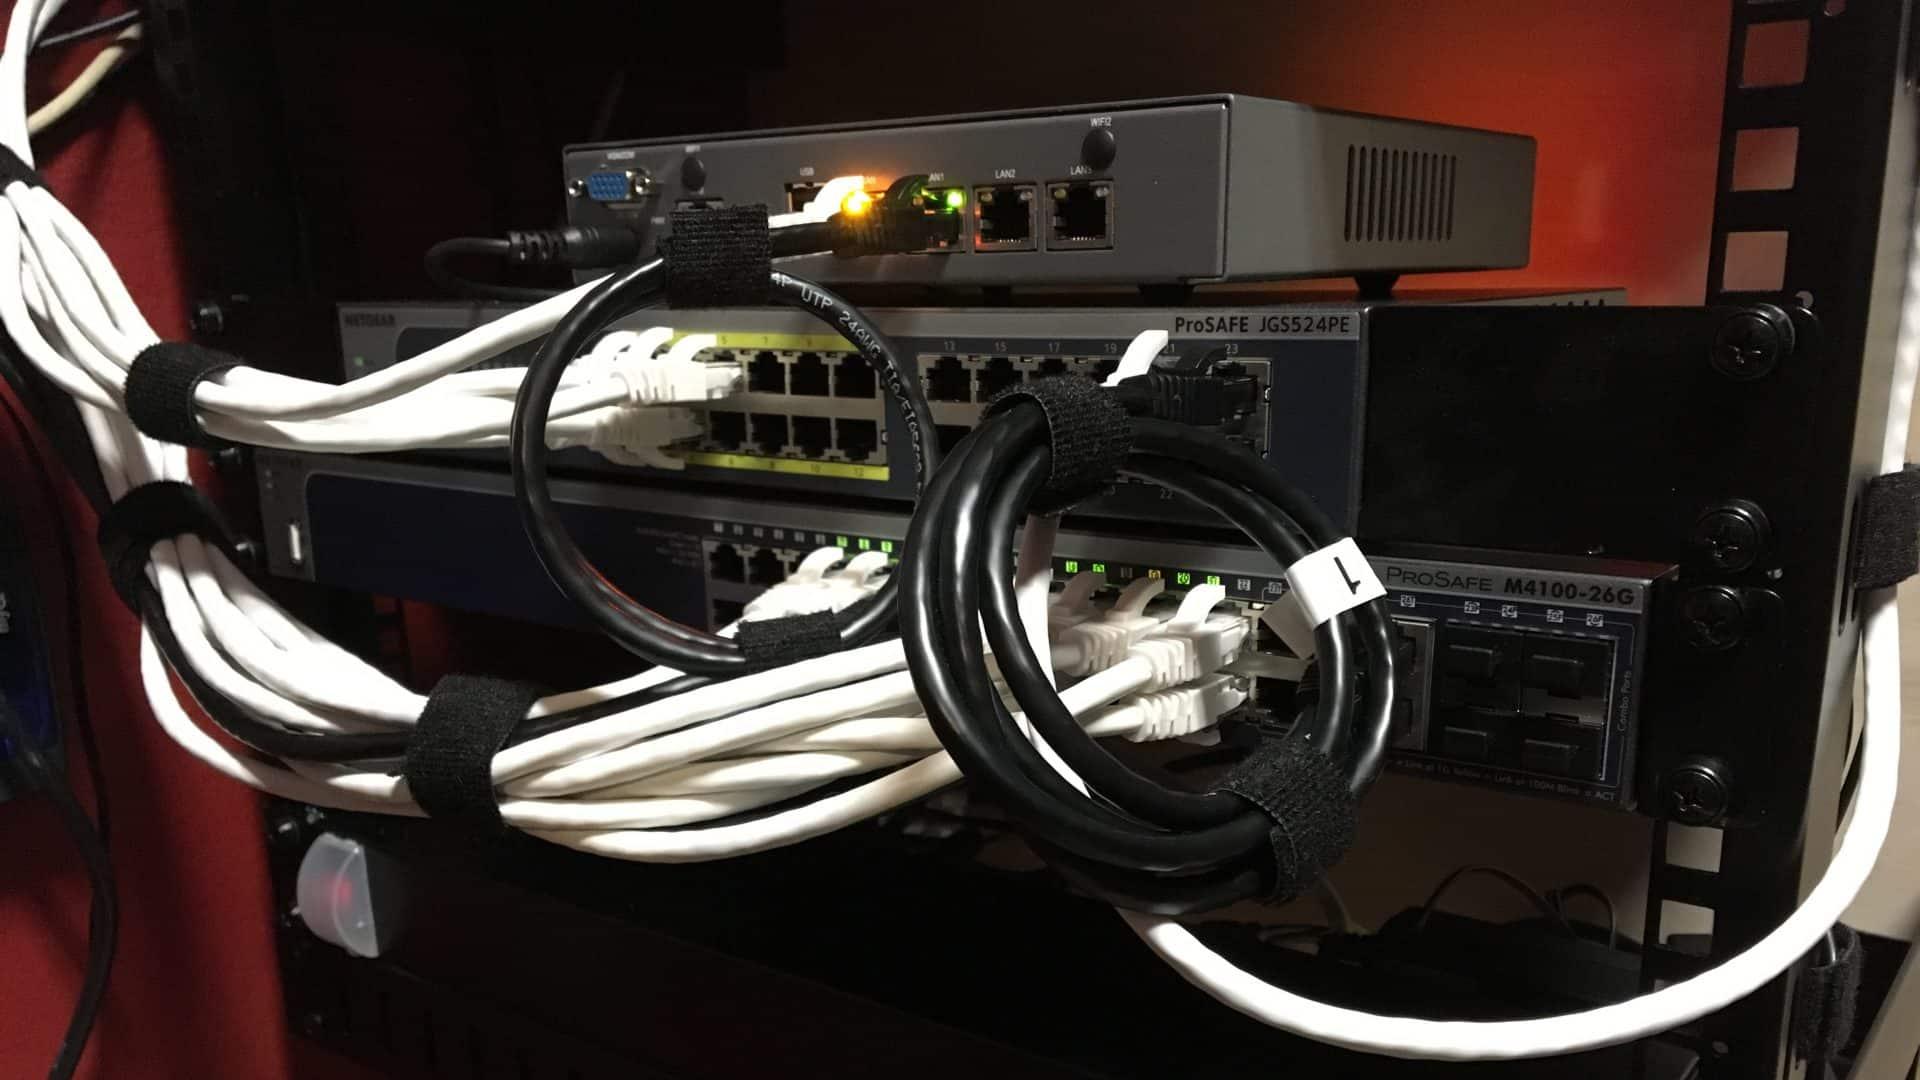 Installing a Home Network Rack hero